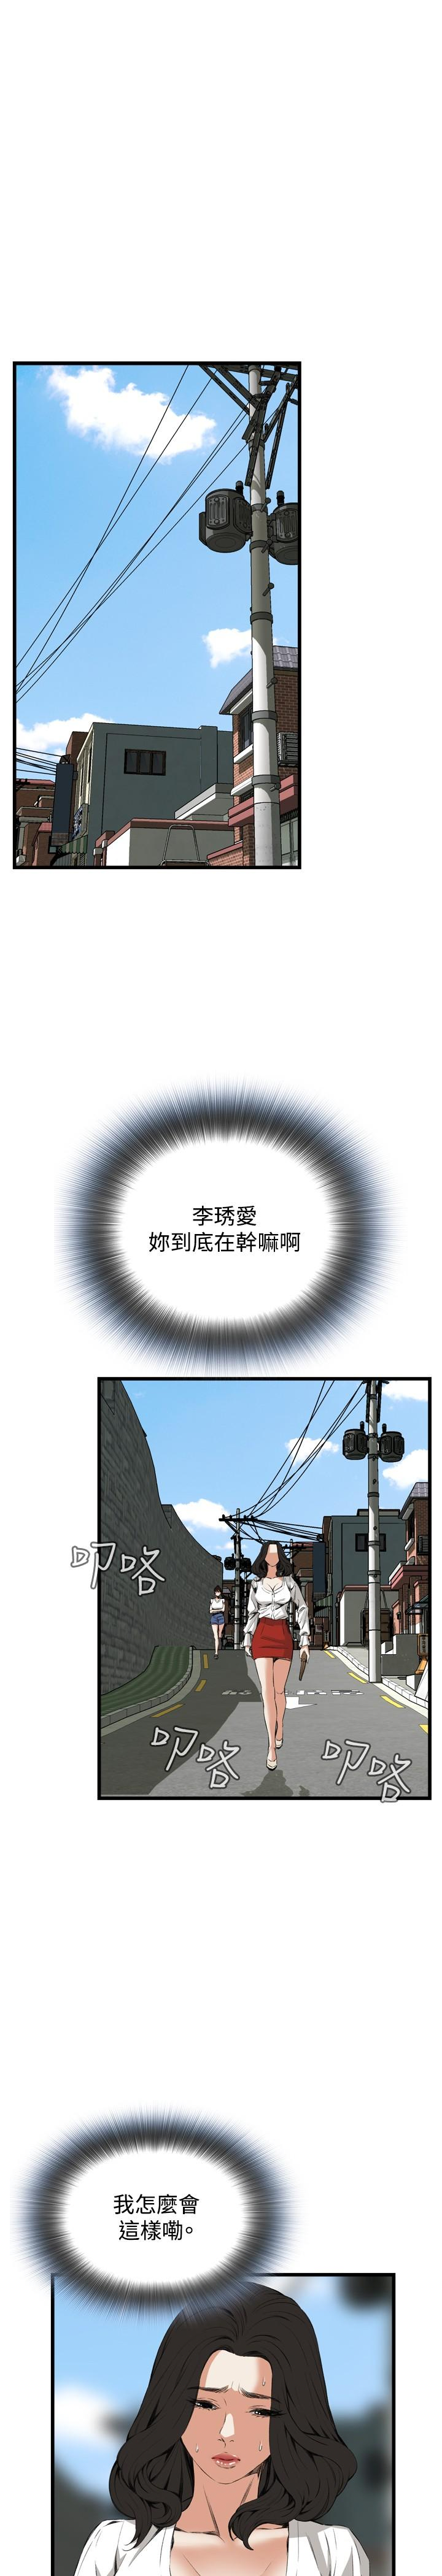 Take a Peek 偷窥 Ch.39~60 [Chinese]中文 378